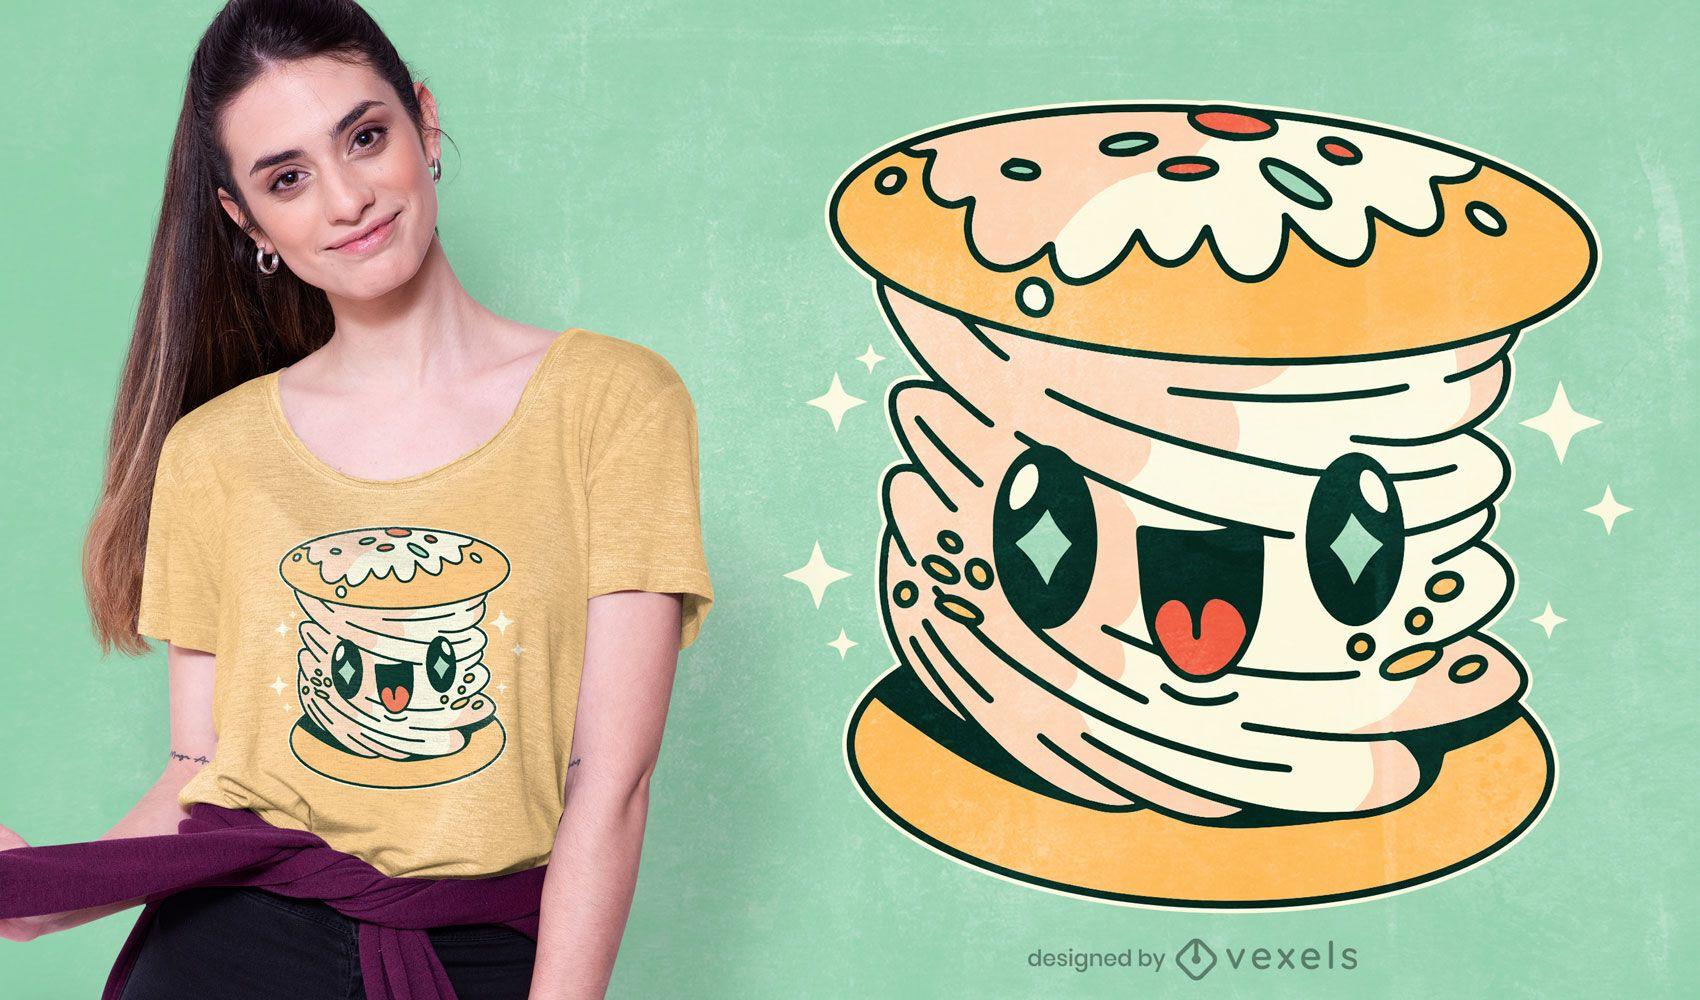 Chantilly pastry kawaii t-shirt design